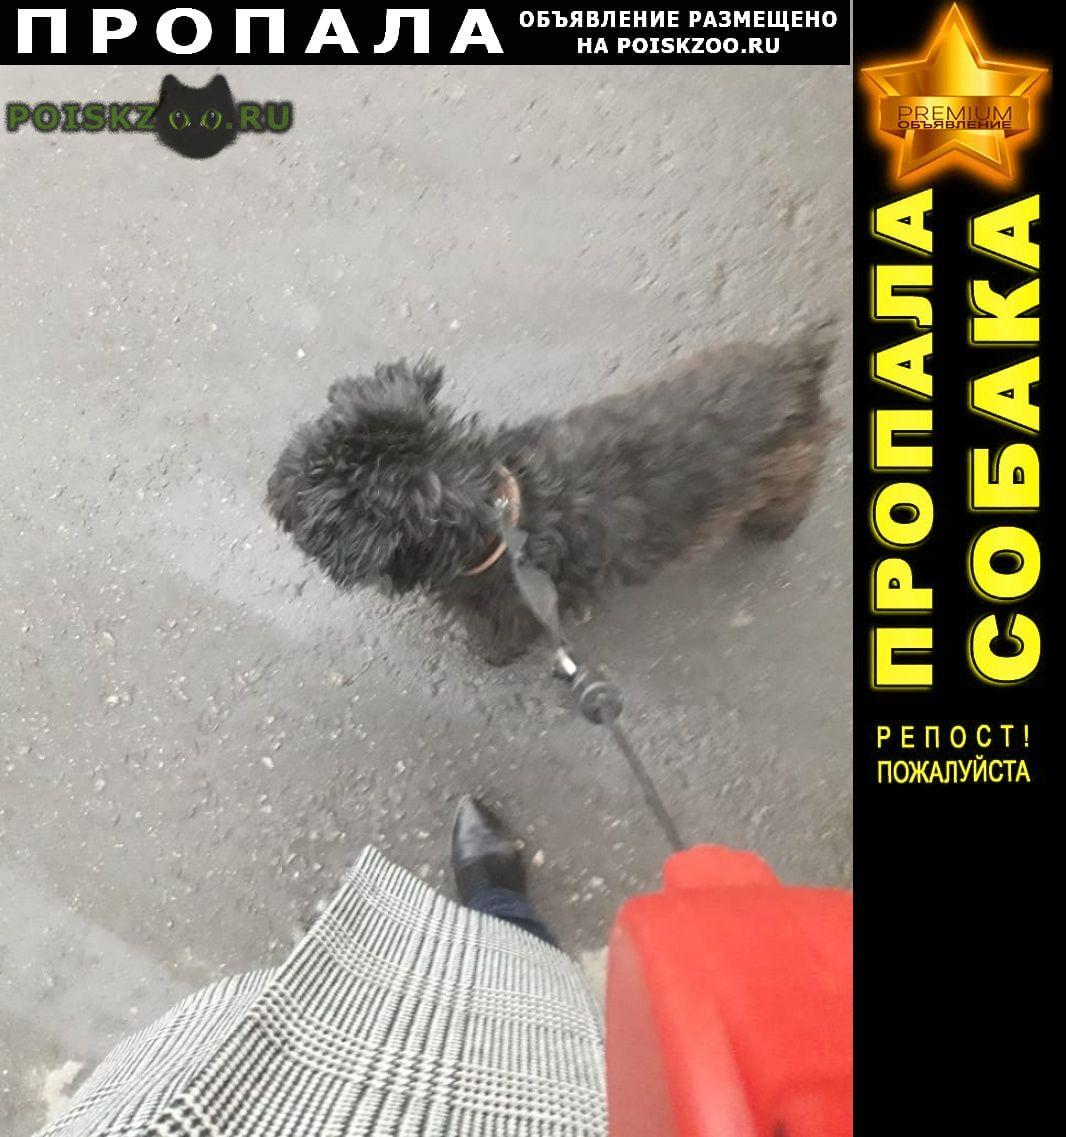 Пропала собака кобель г.Пенза